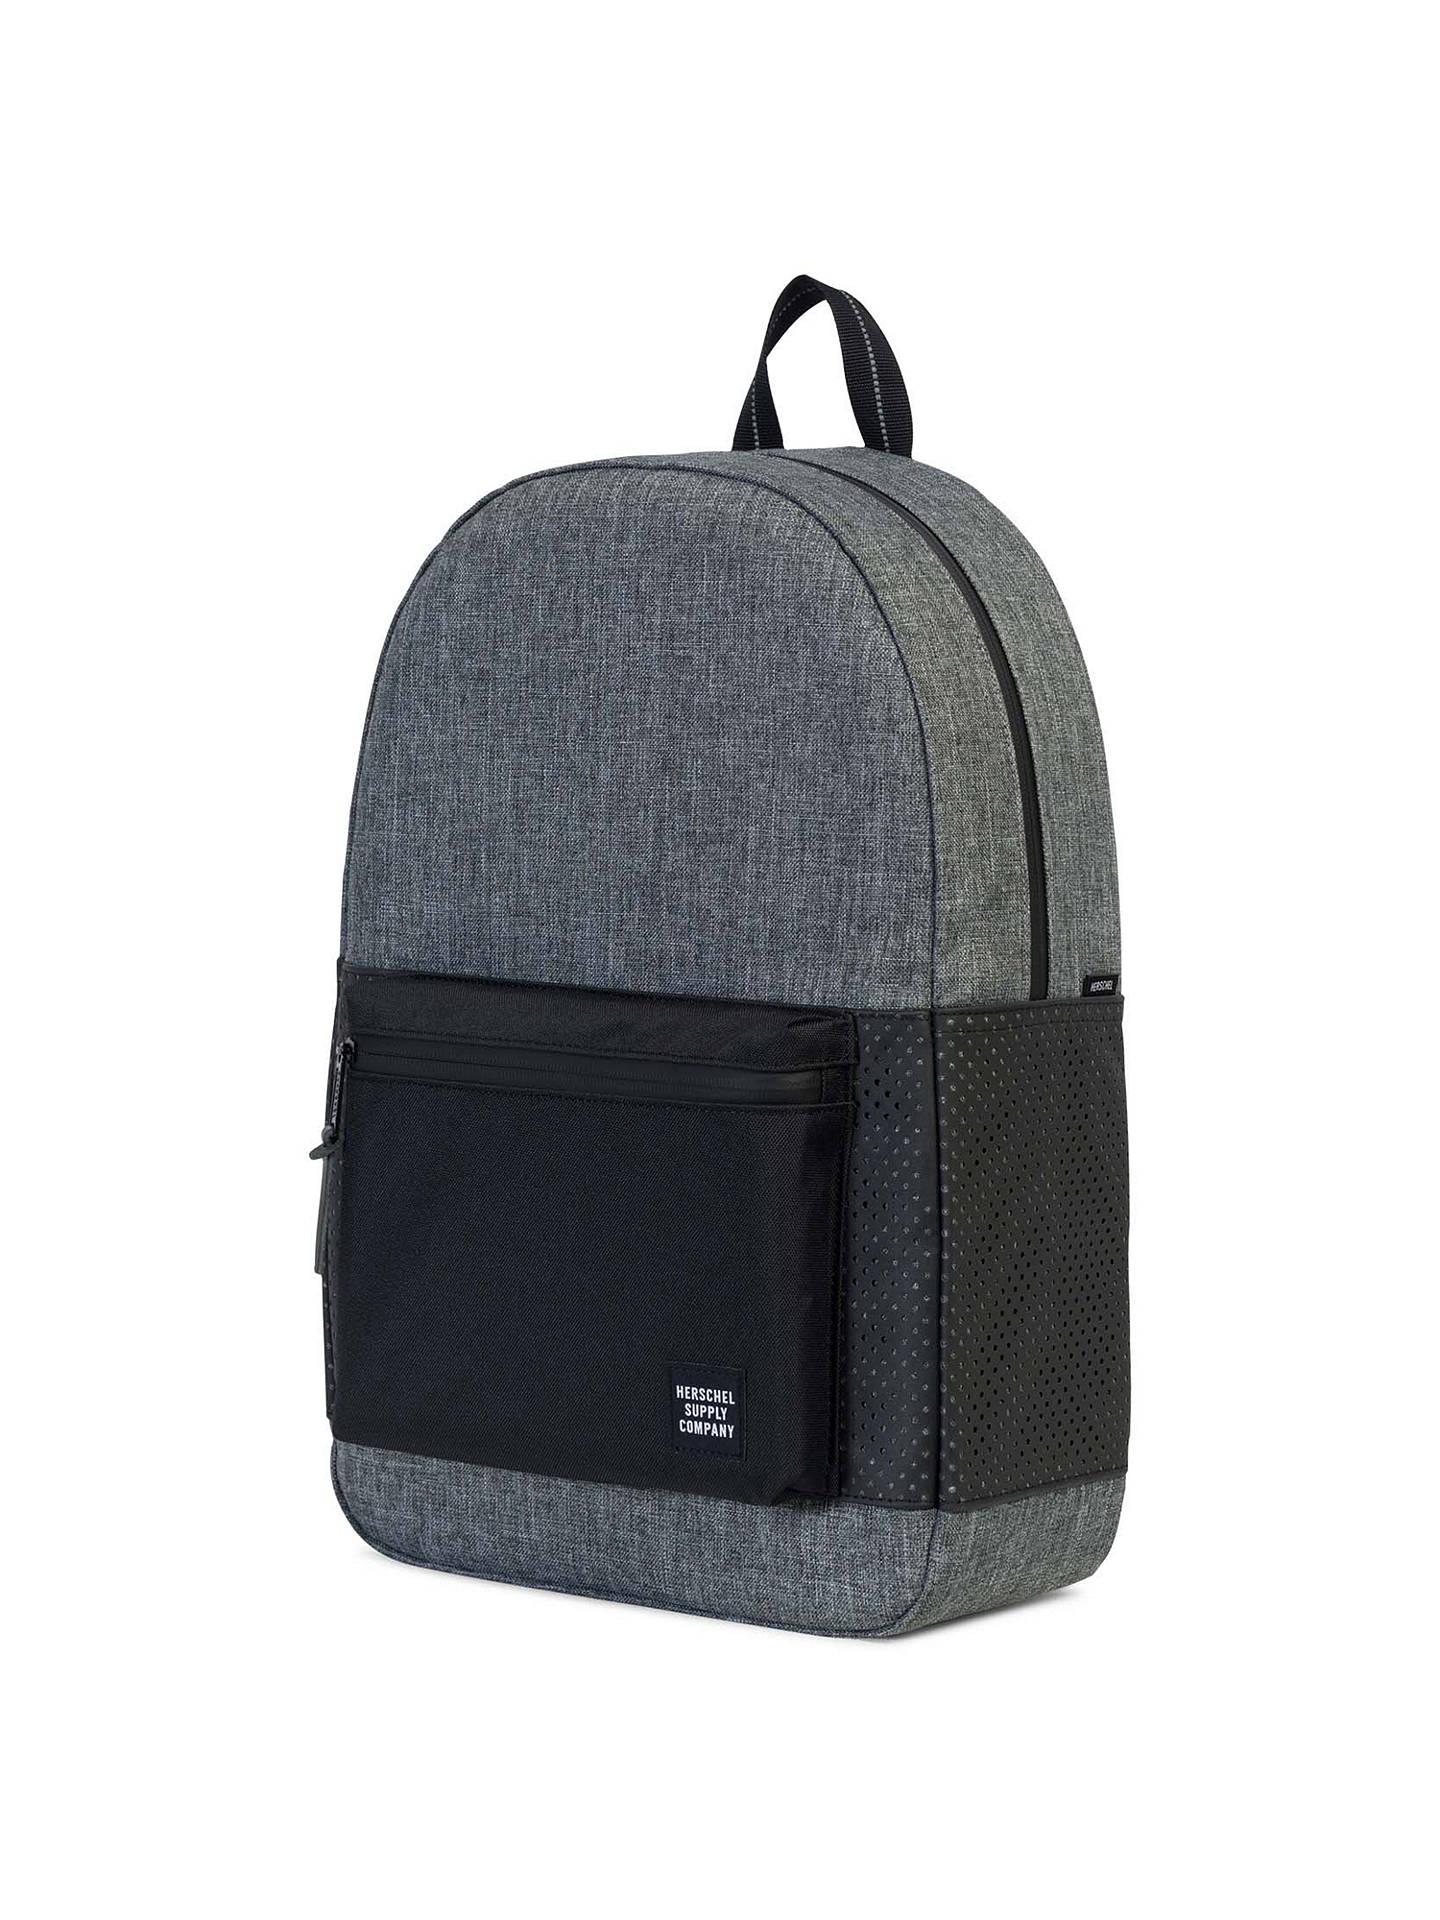 9dd016de2fd5 ... Buy Herschel Supply Co. Settlement Backpack